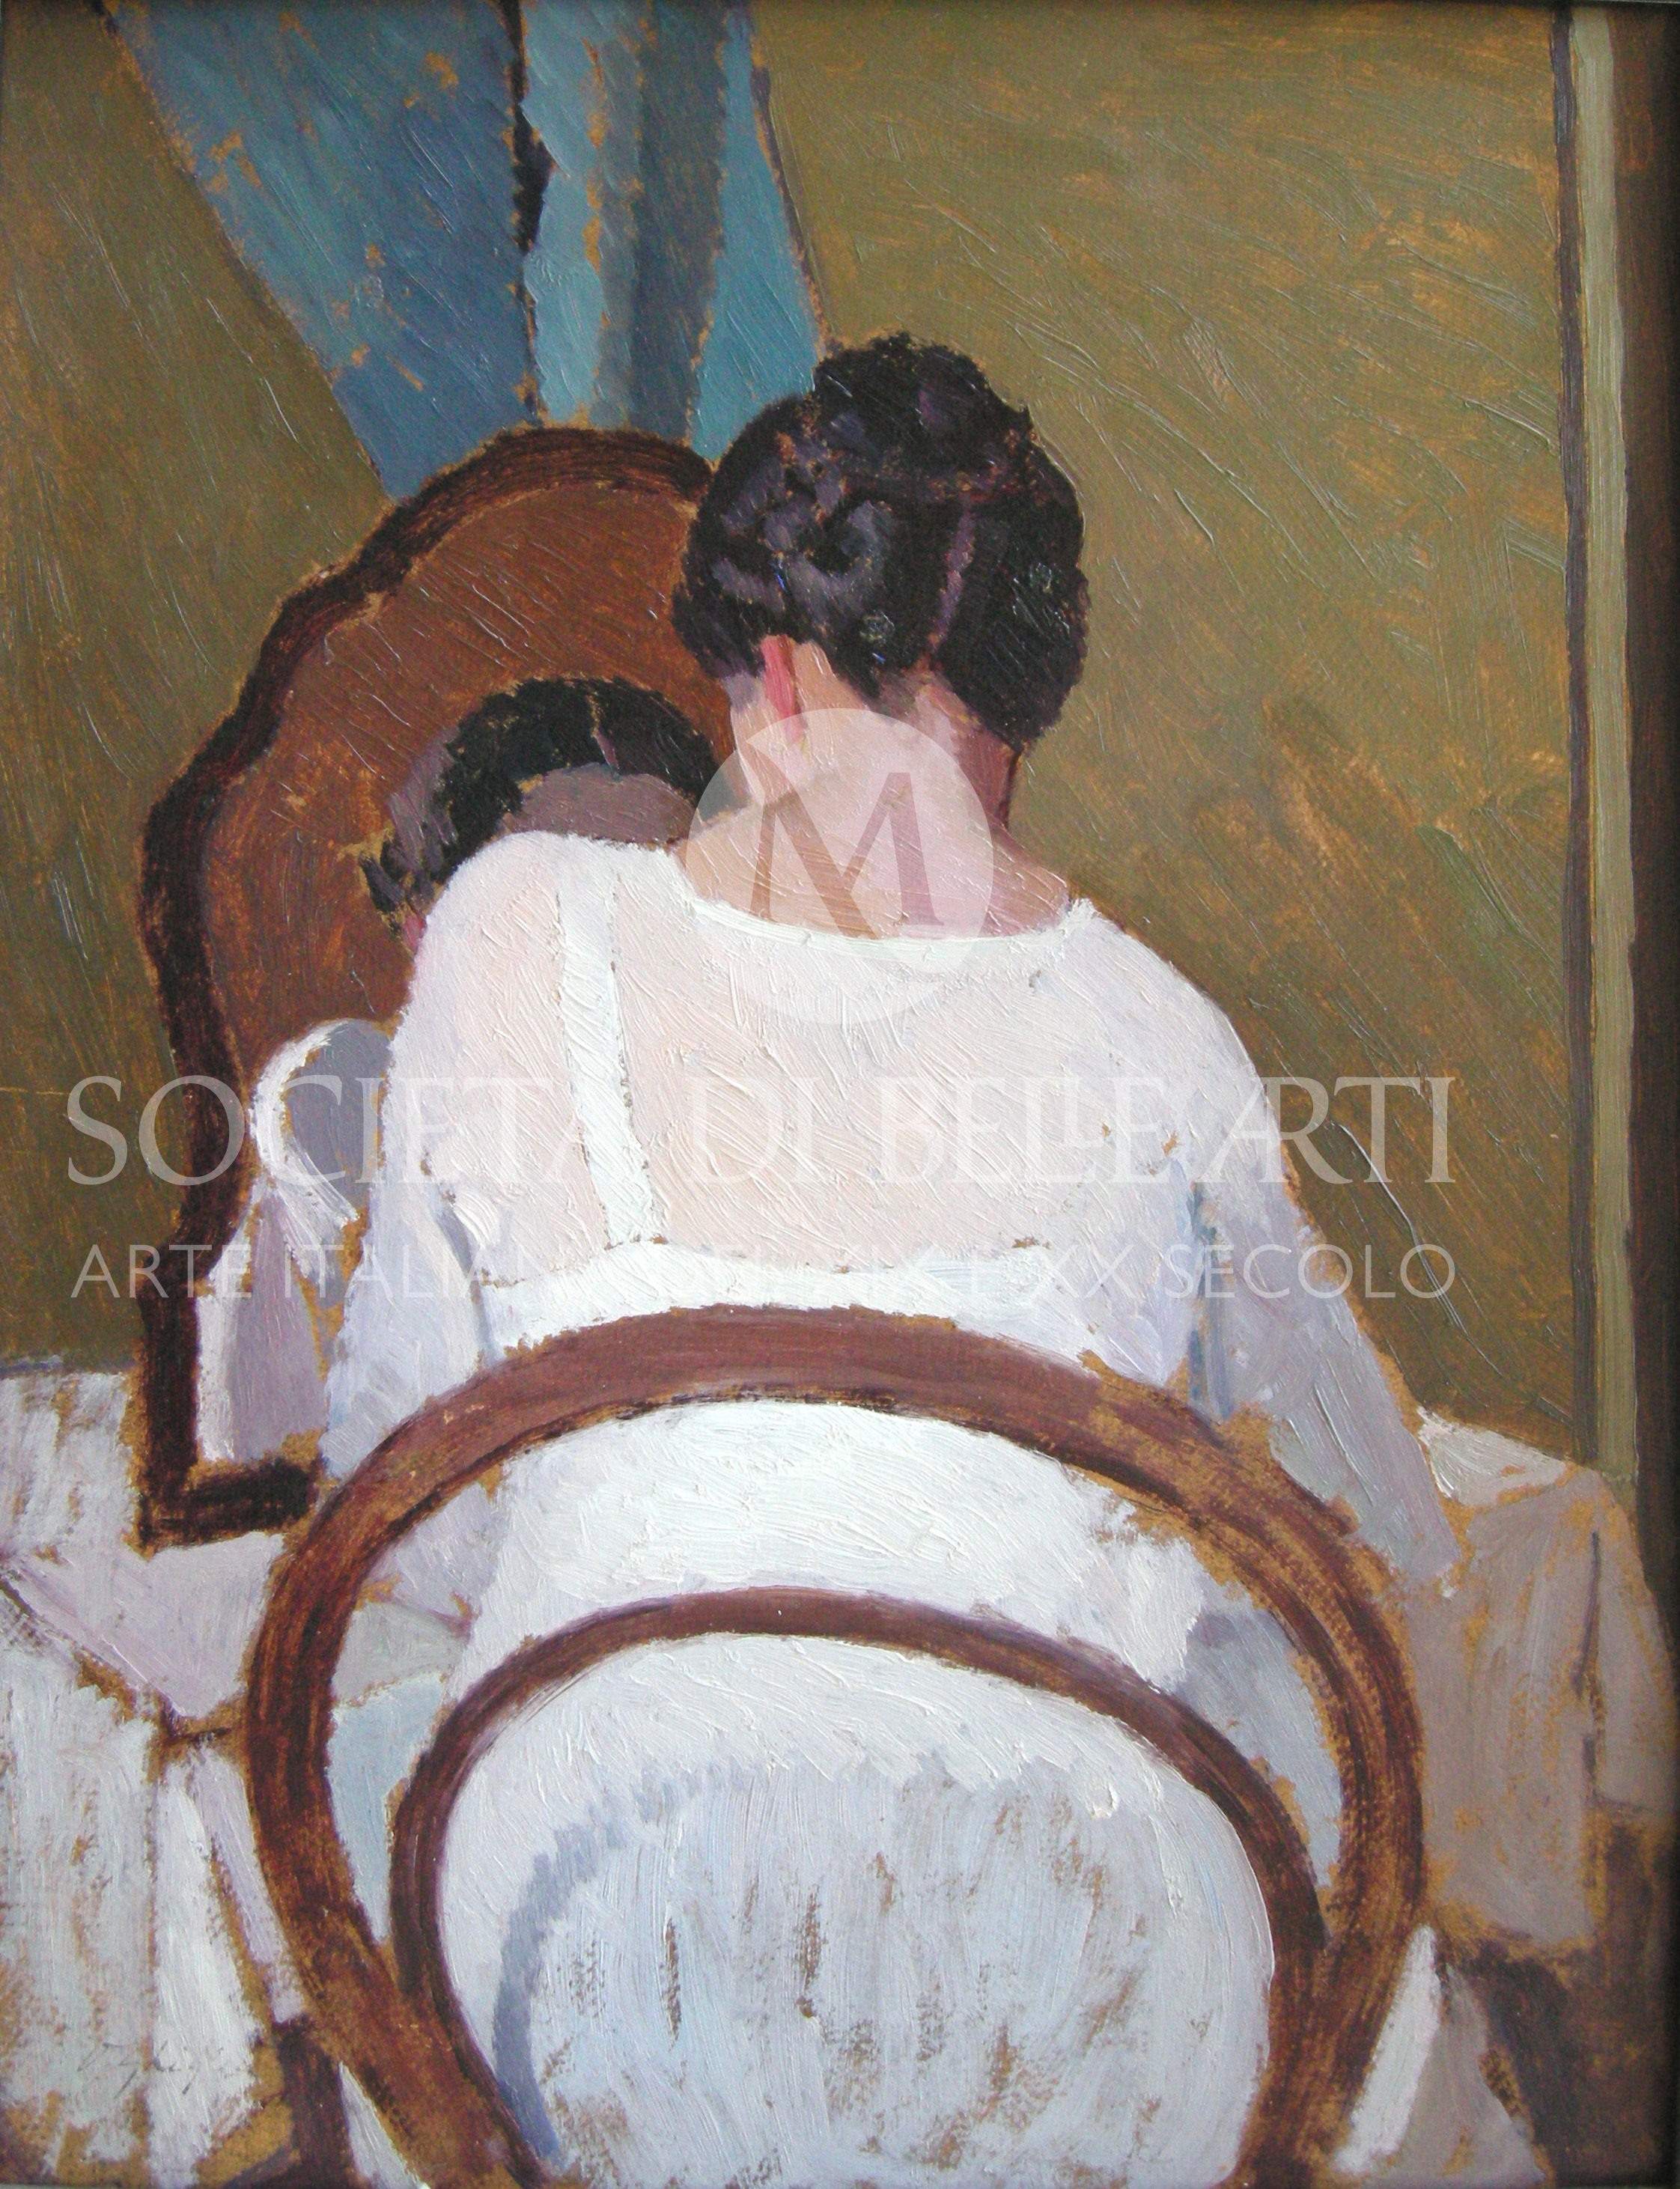 Oscar Ghiglia dipinti del '900 vendita